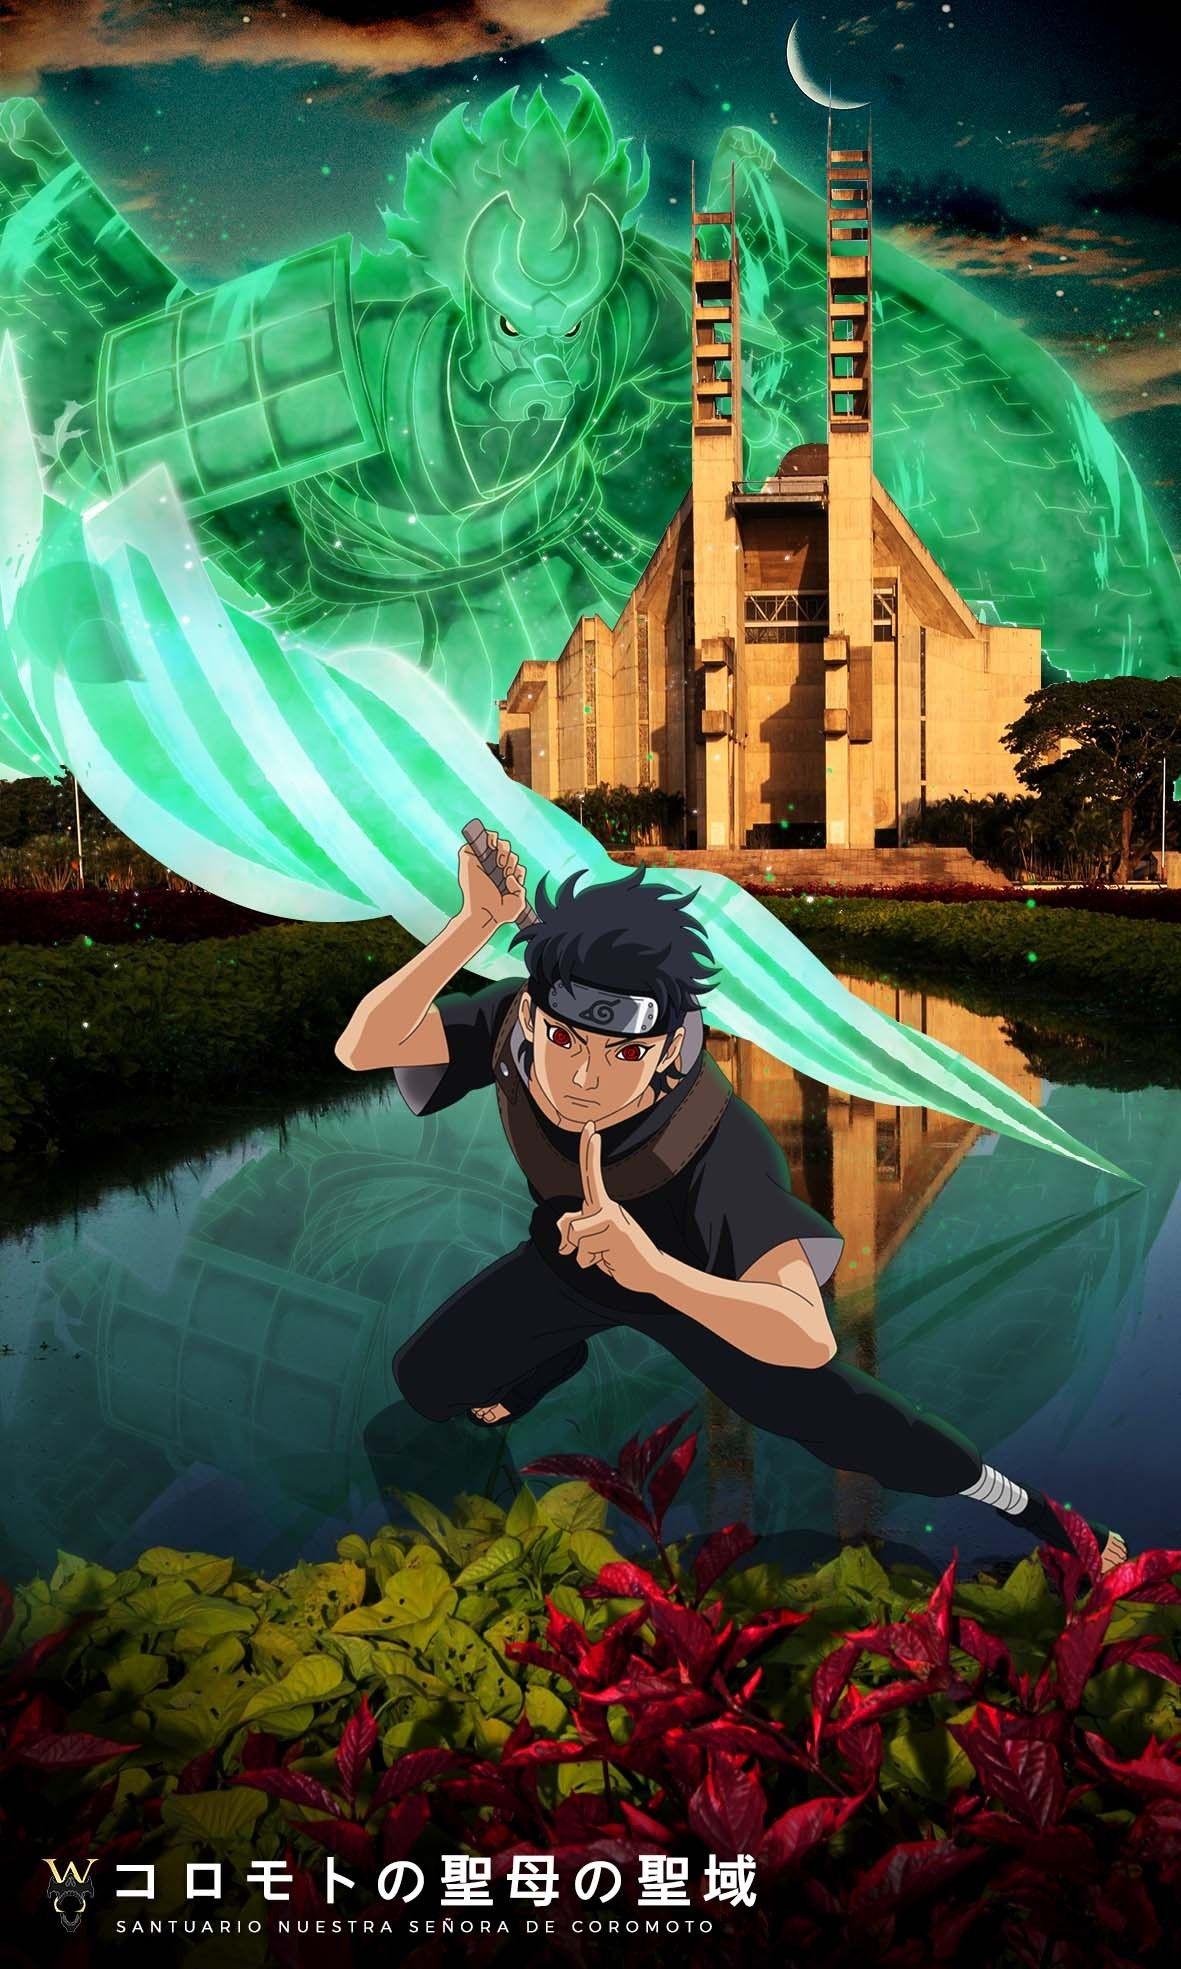 Shisui And His Susanoo In Venezuela Shisui Anime Anime Naruto